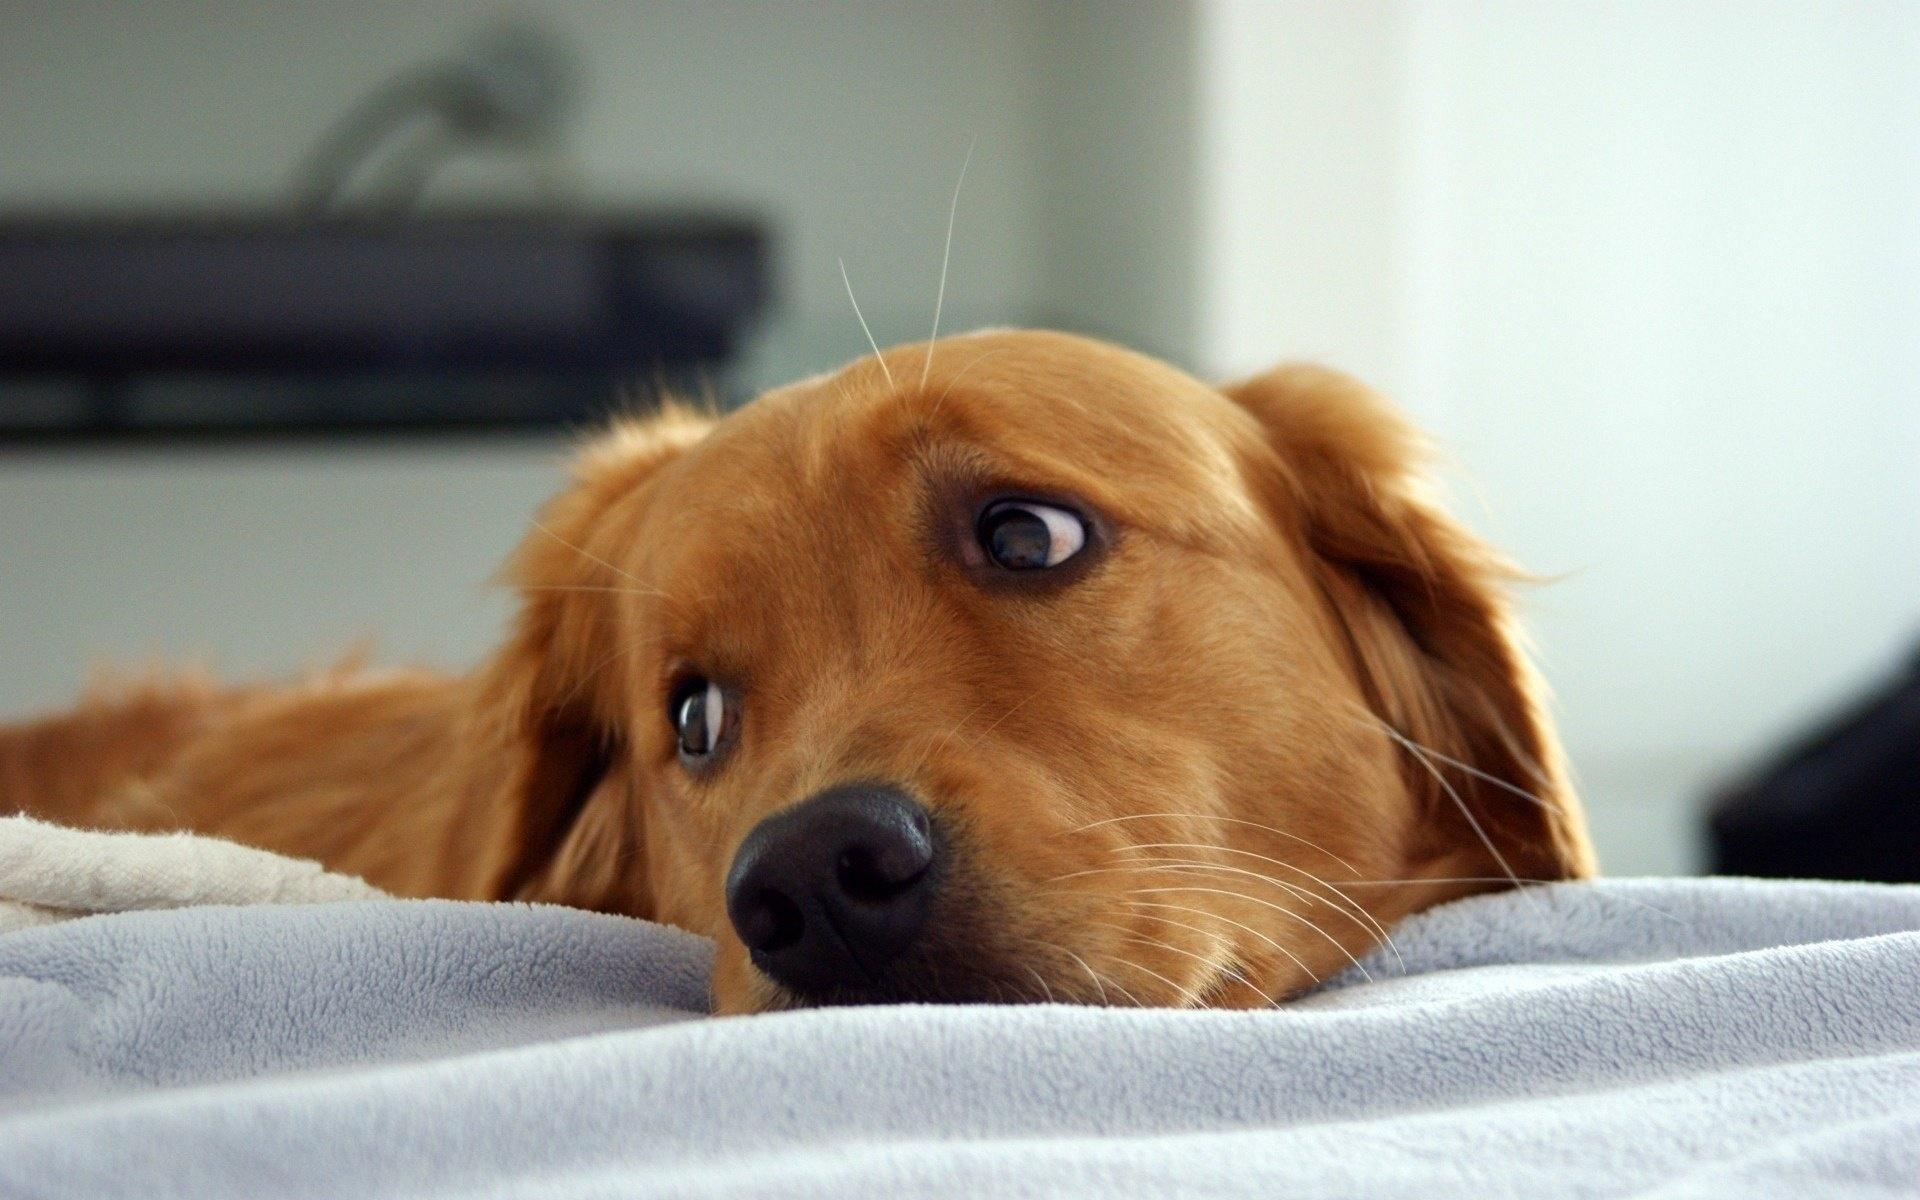 Sad Puppy #6937789